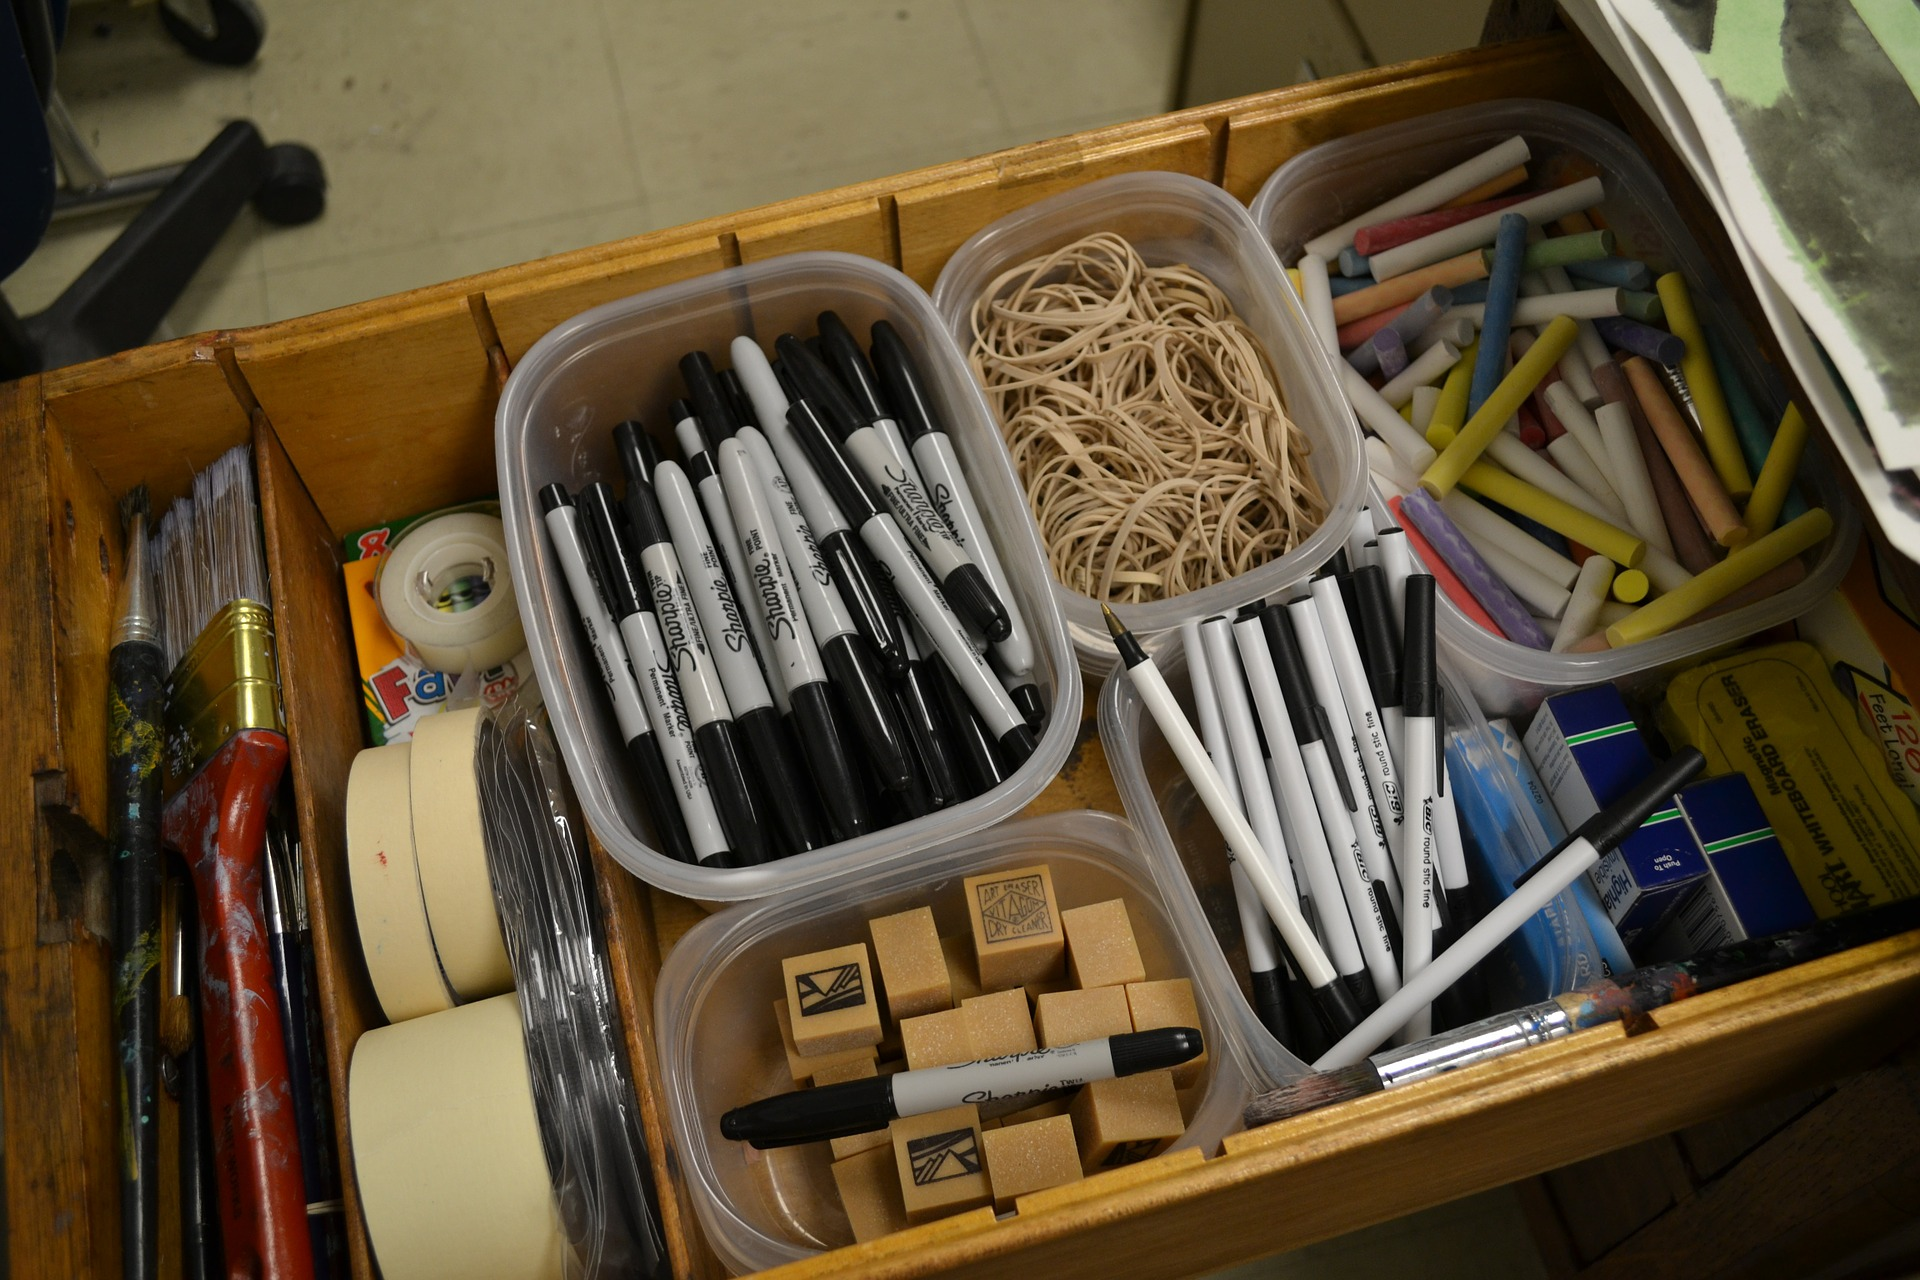 #miniretorganización -